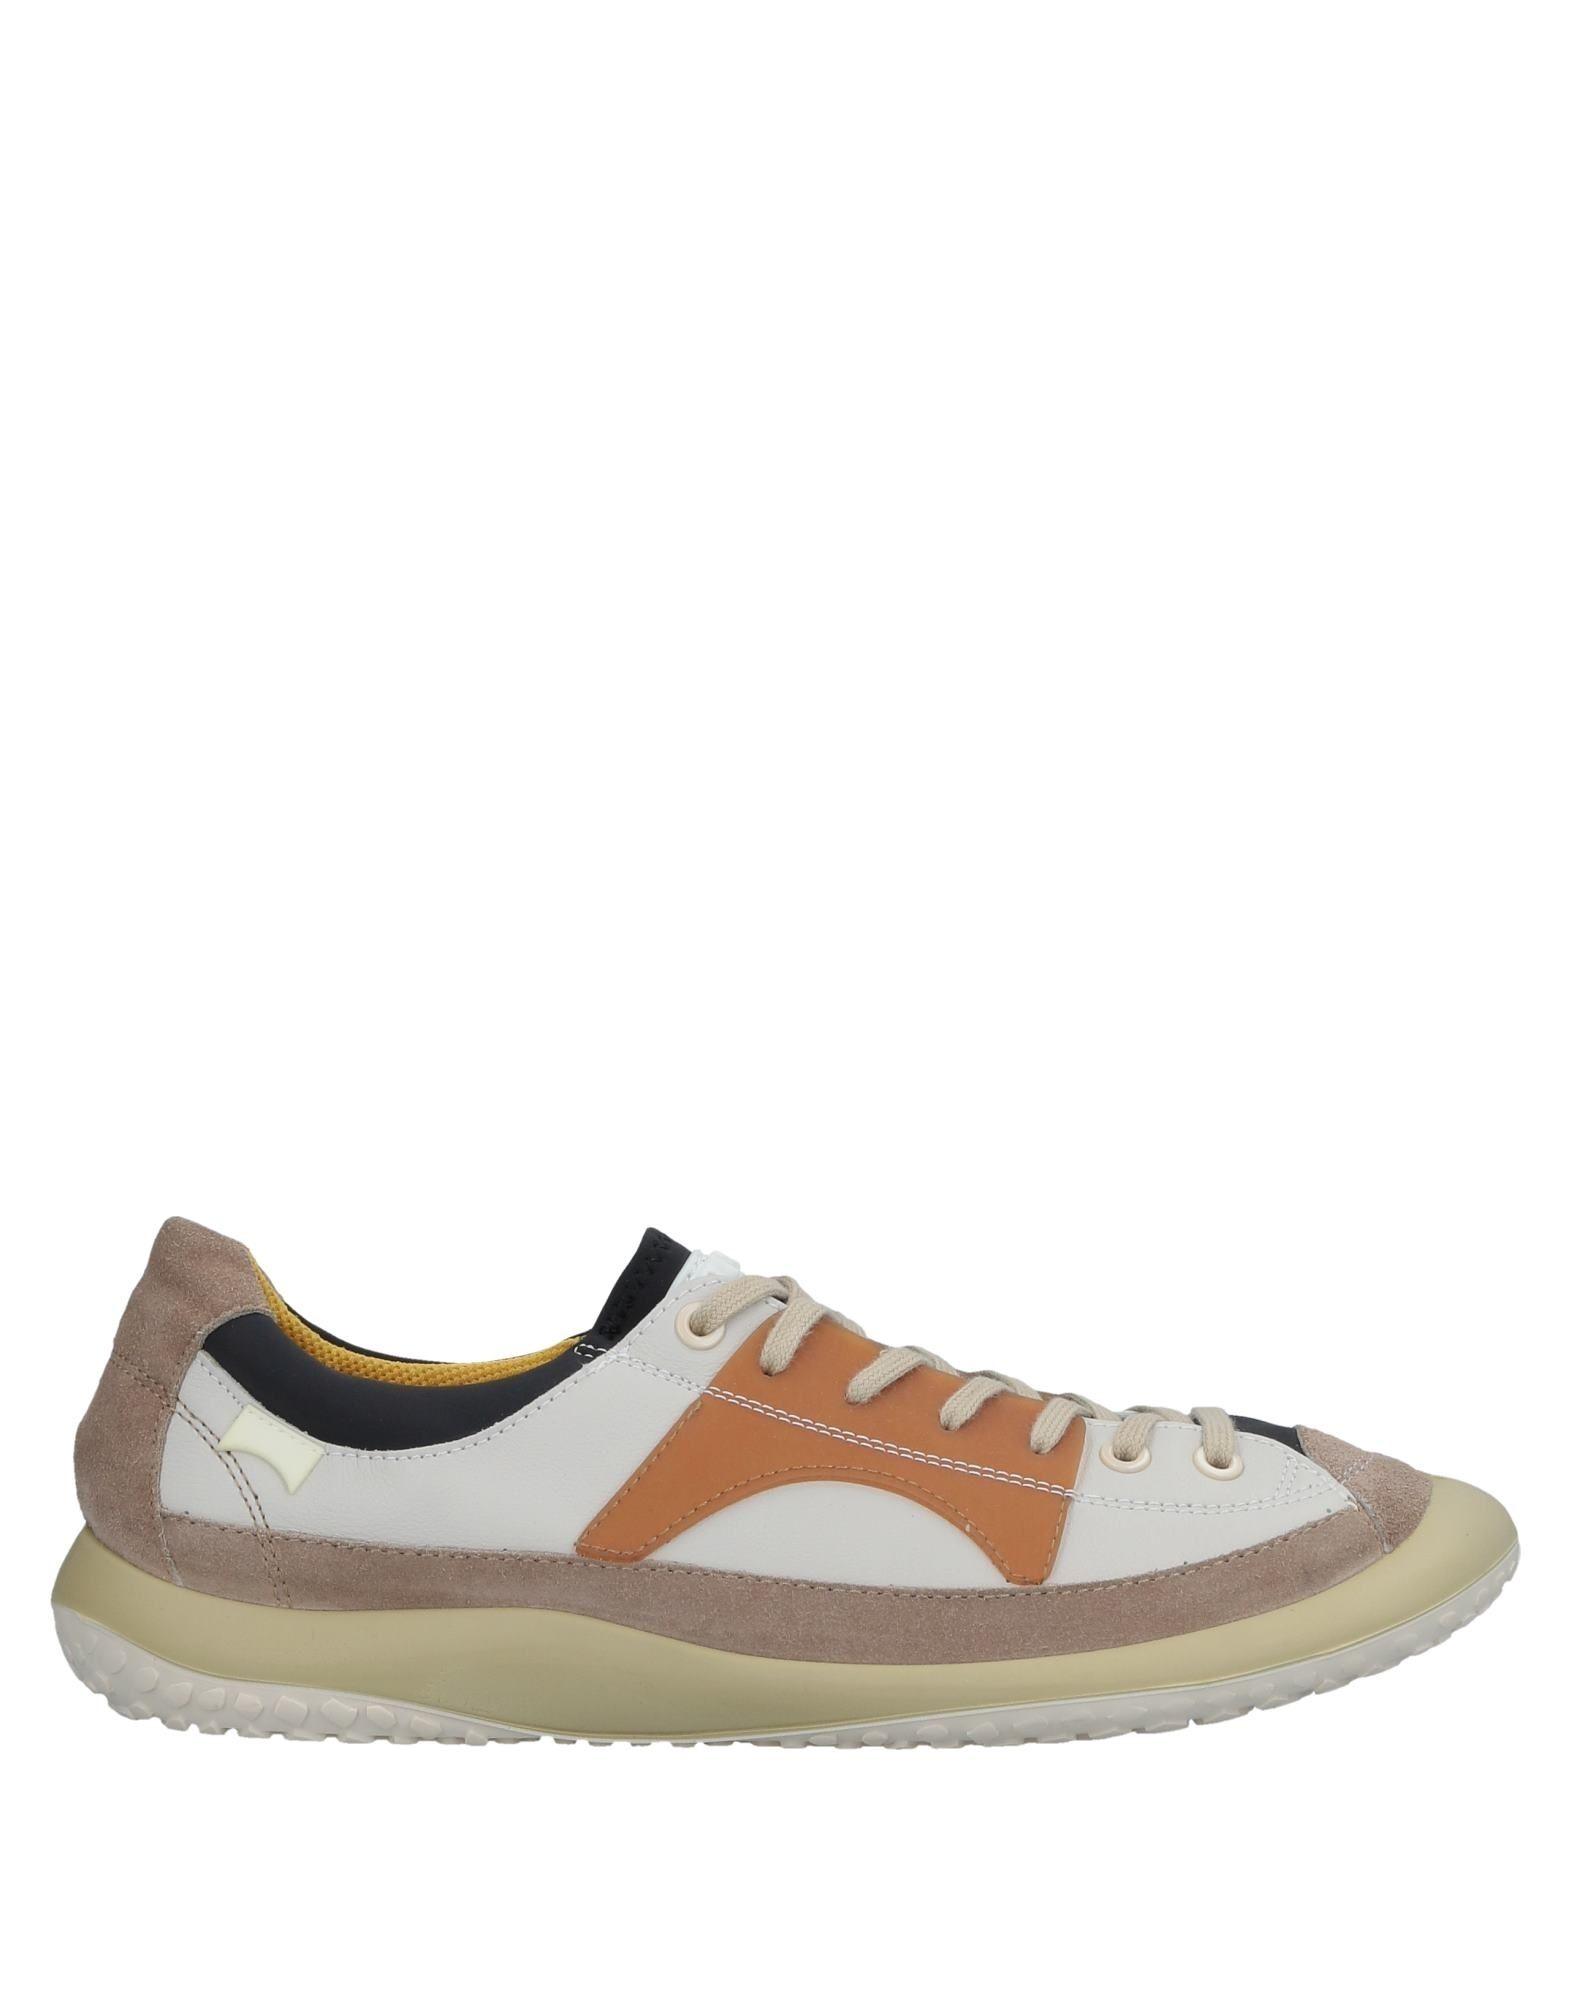 Camper Sneakers Herren  11525566FC Gute Qualität beliebte Schuhe